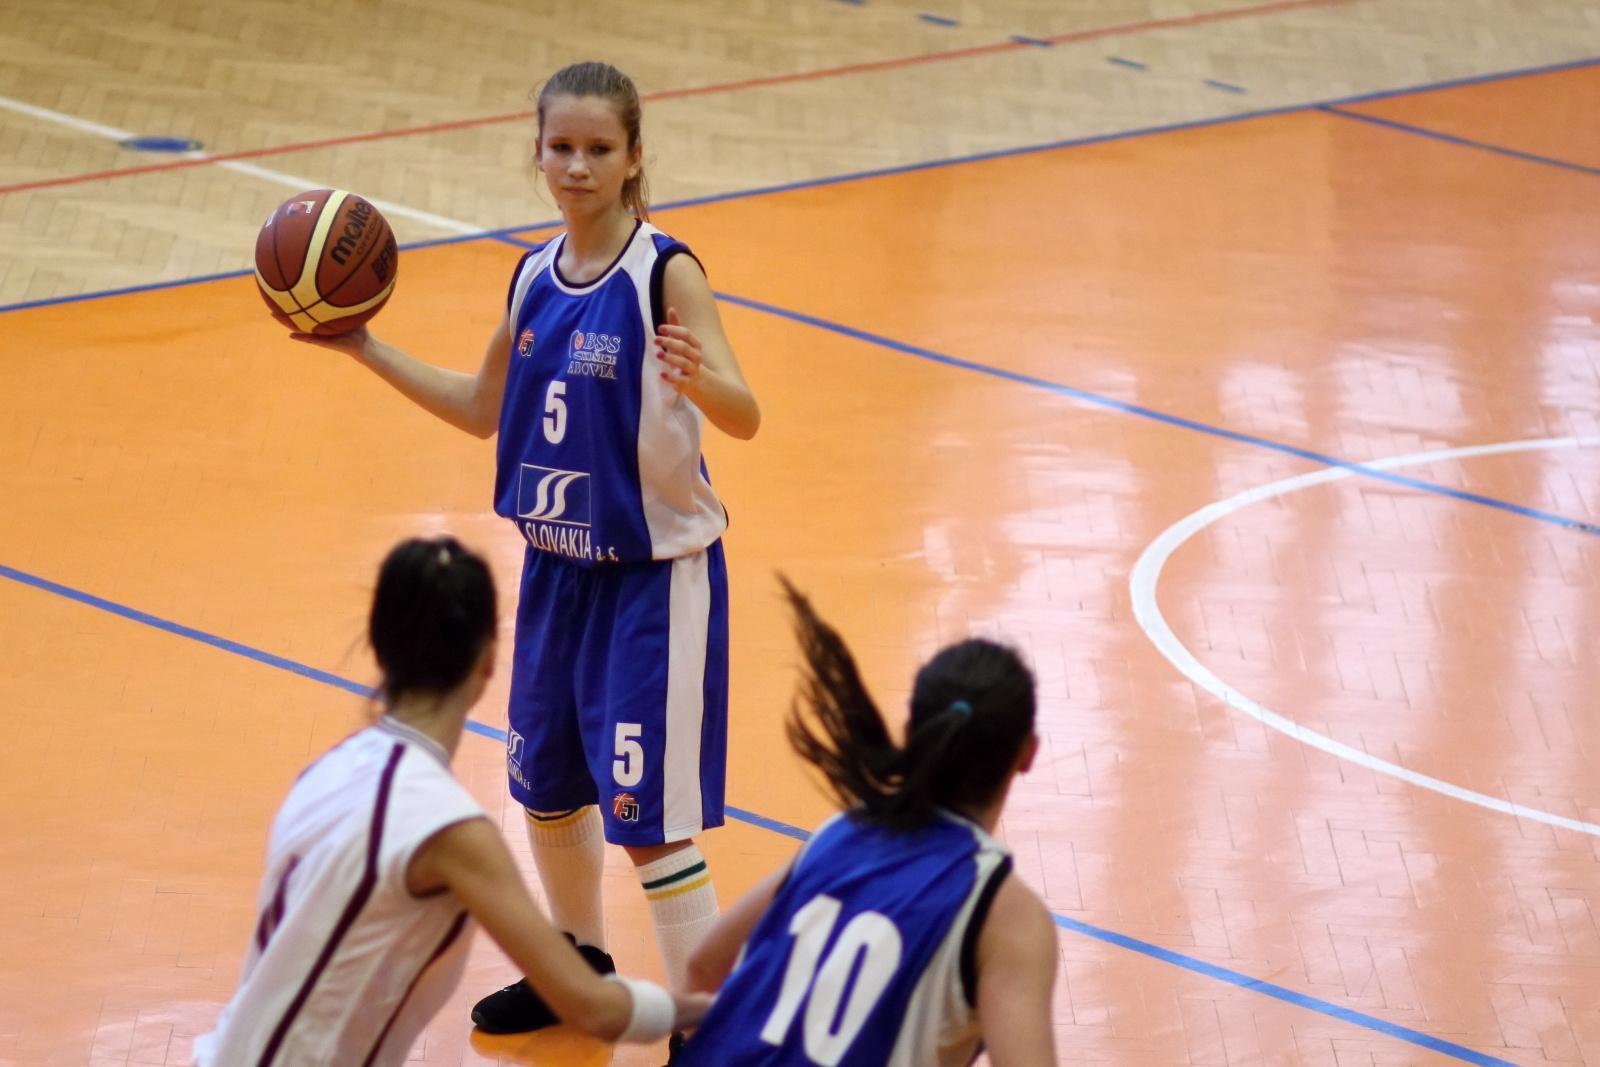 bk-zvolen-abovia-kosice-ziacky-basketbal-2011-6